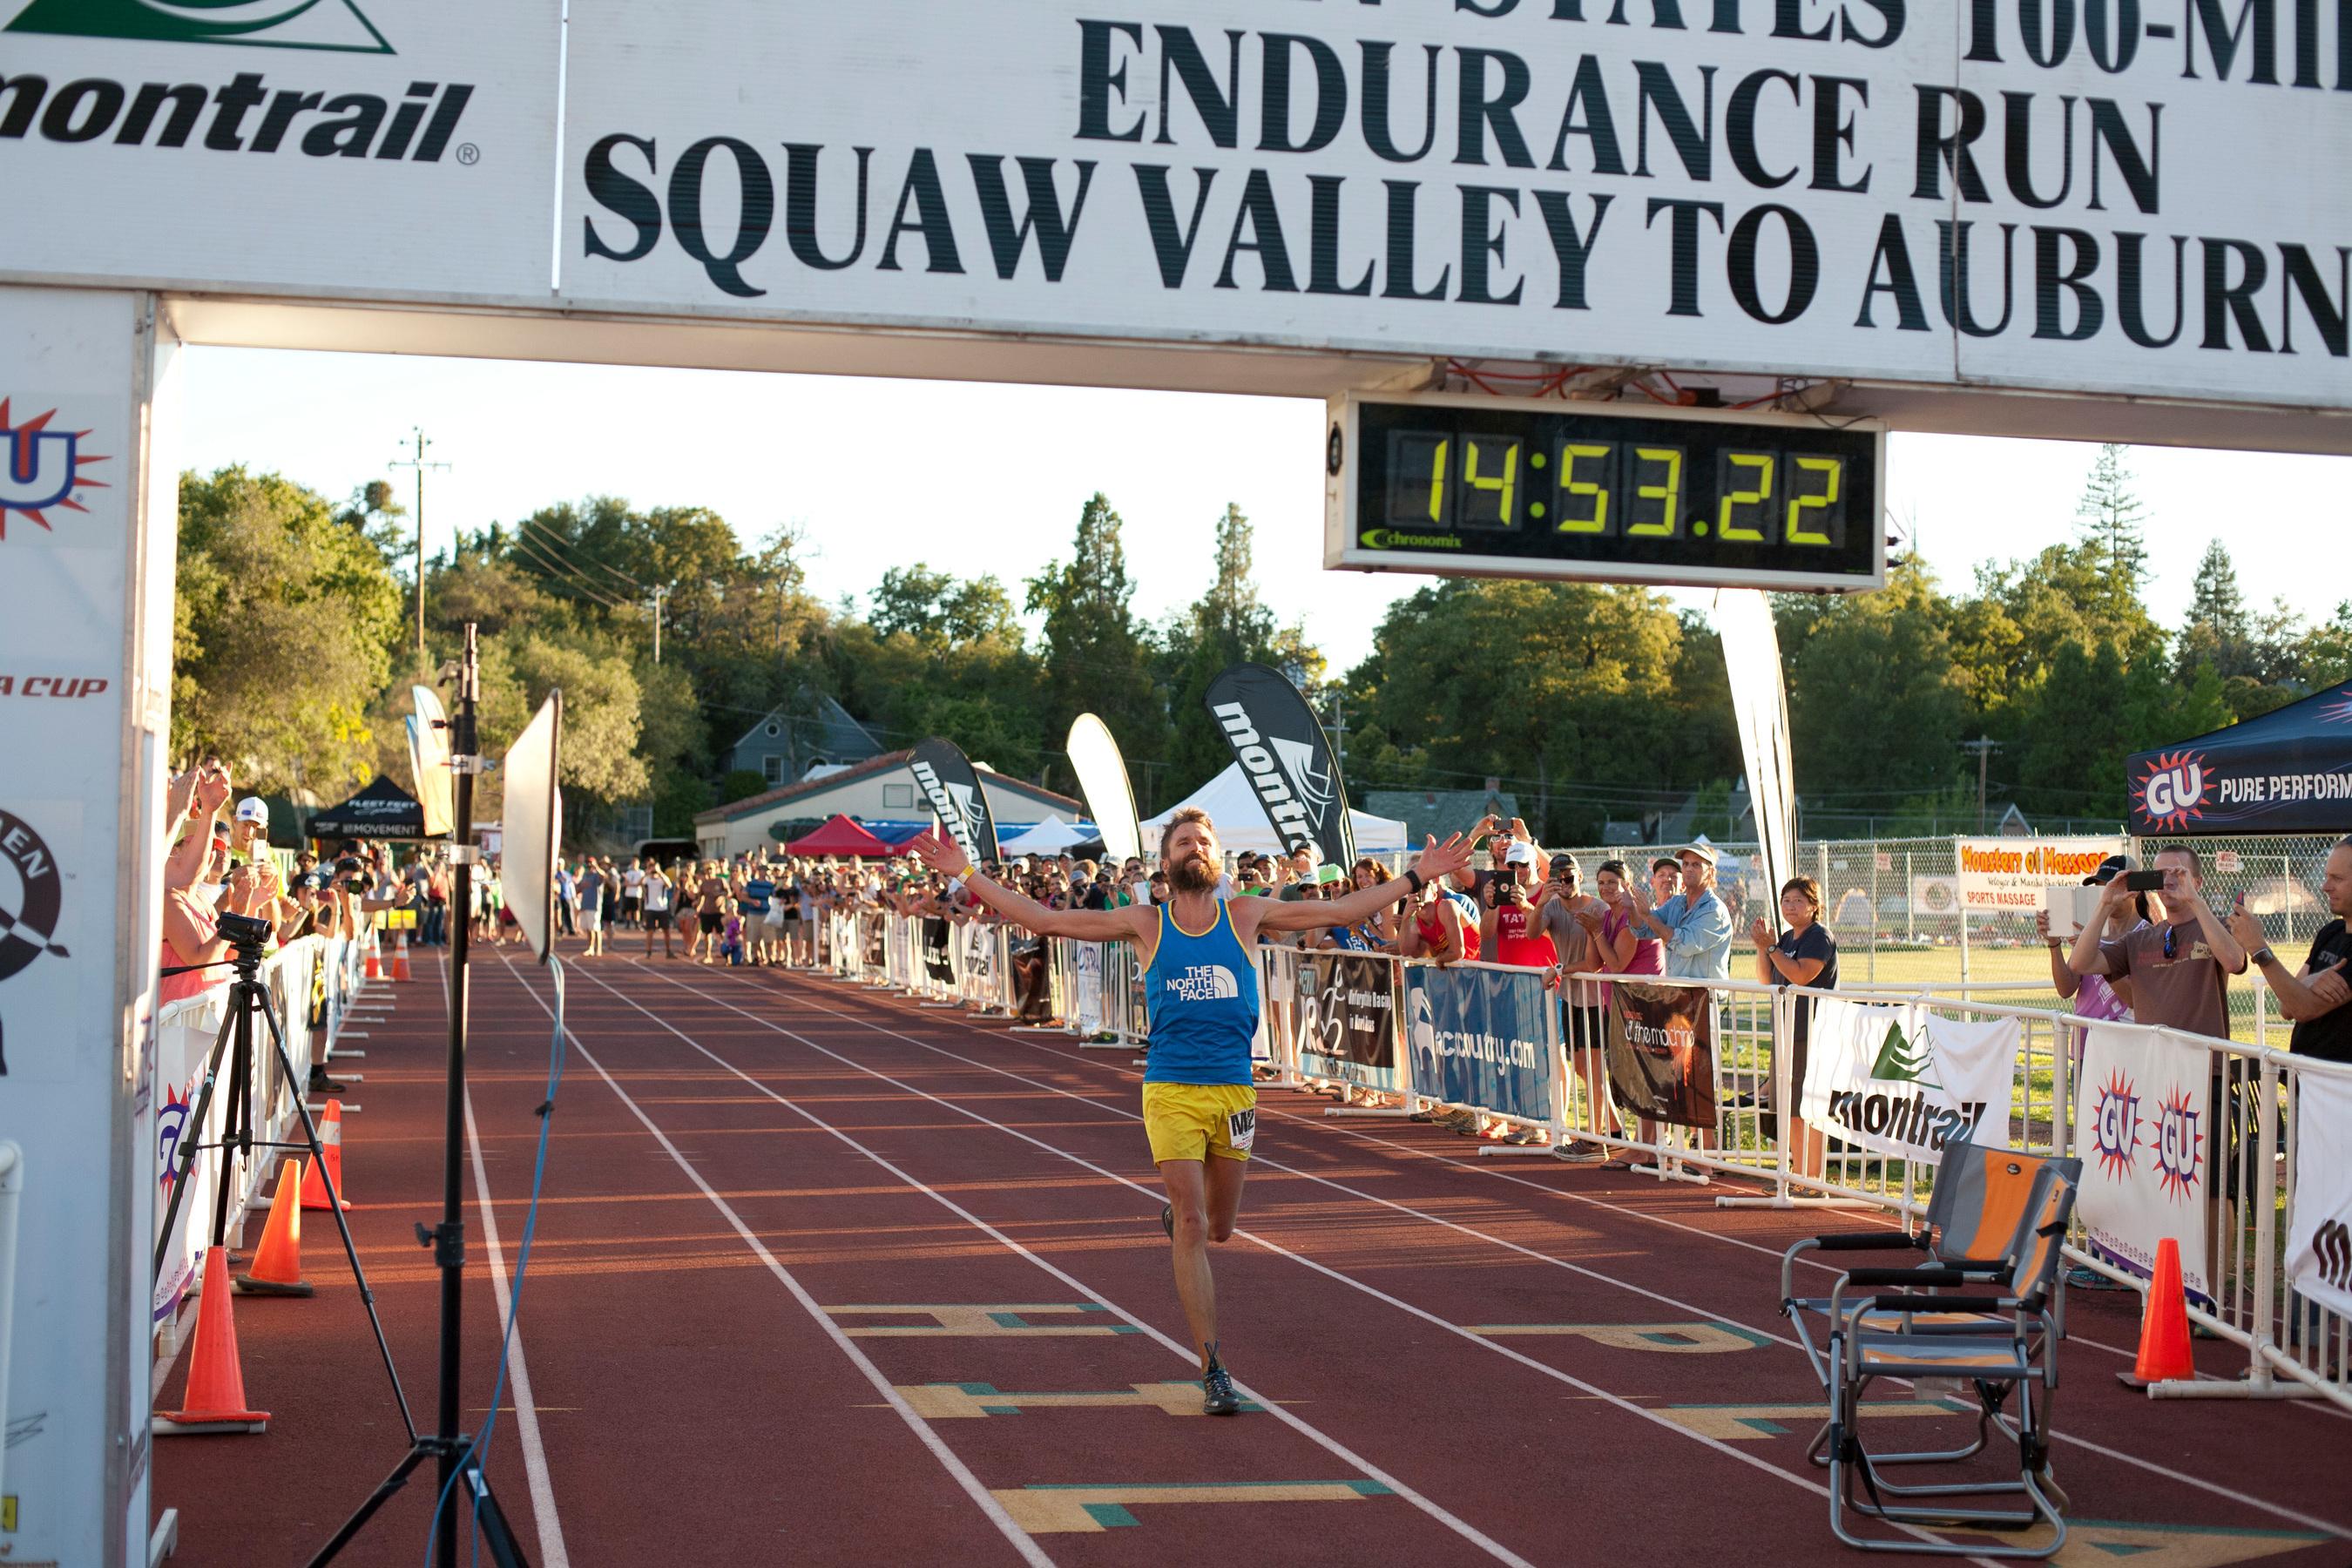 North Face Athletes Win Top Titles at Western States 100 Mile Endurance Run